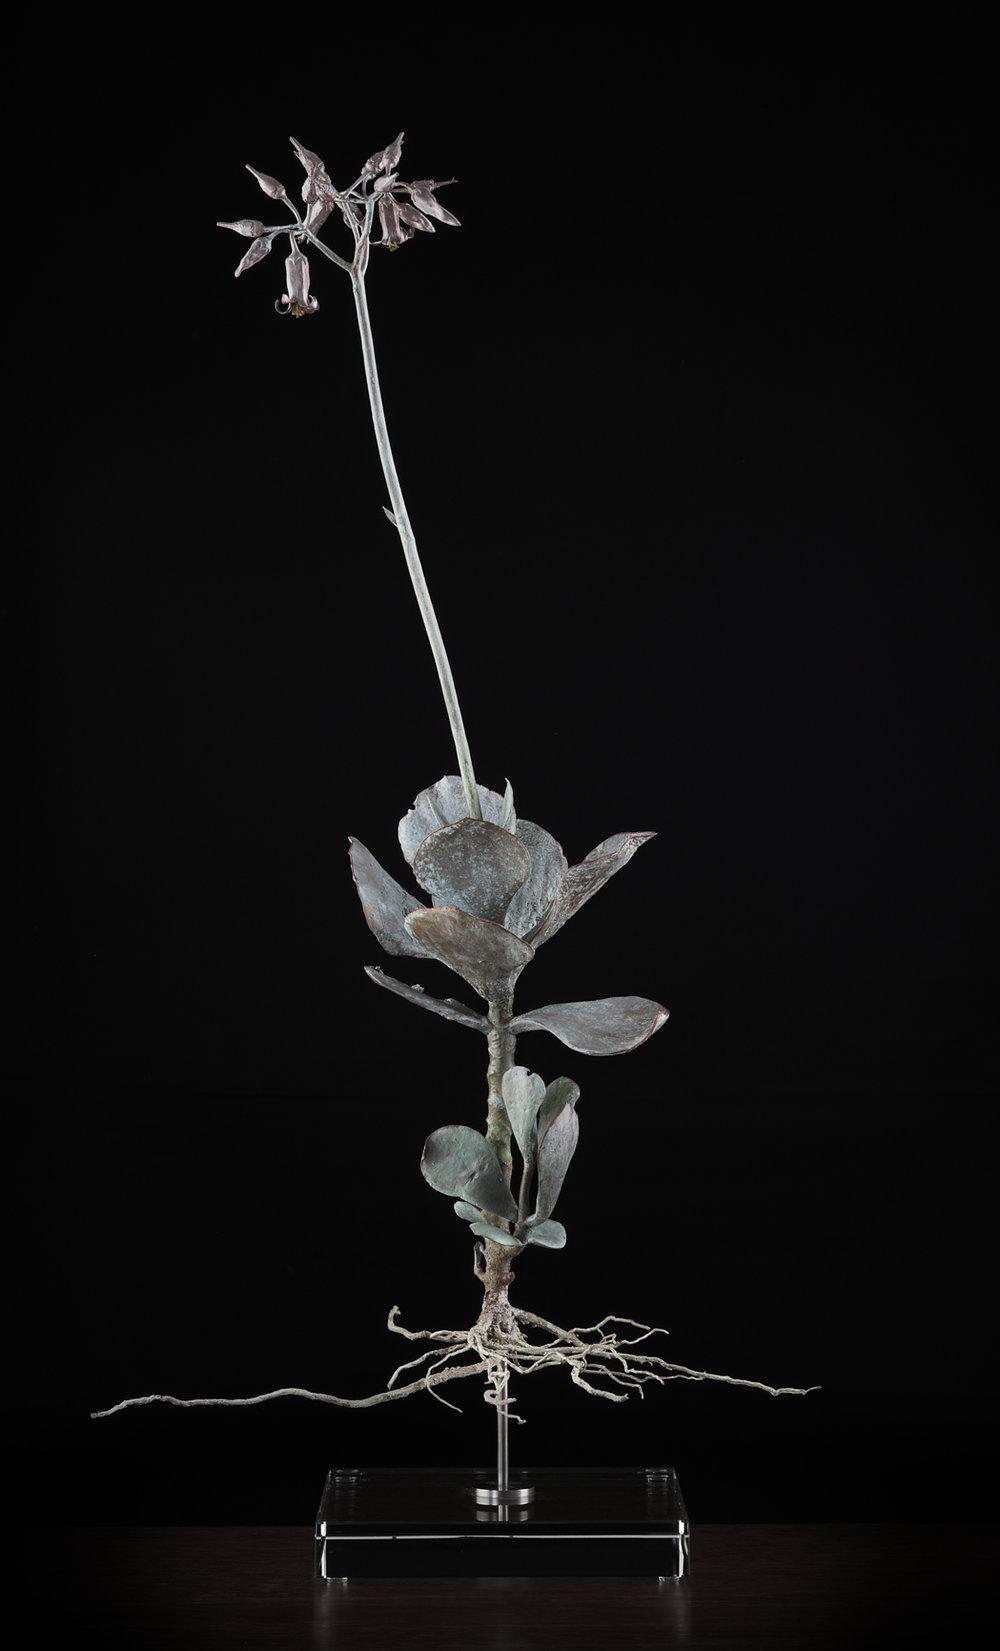 <i> Coteledon orbiculata </i>